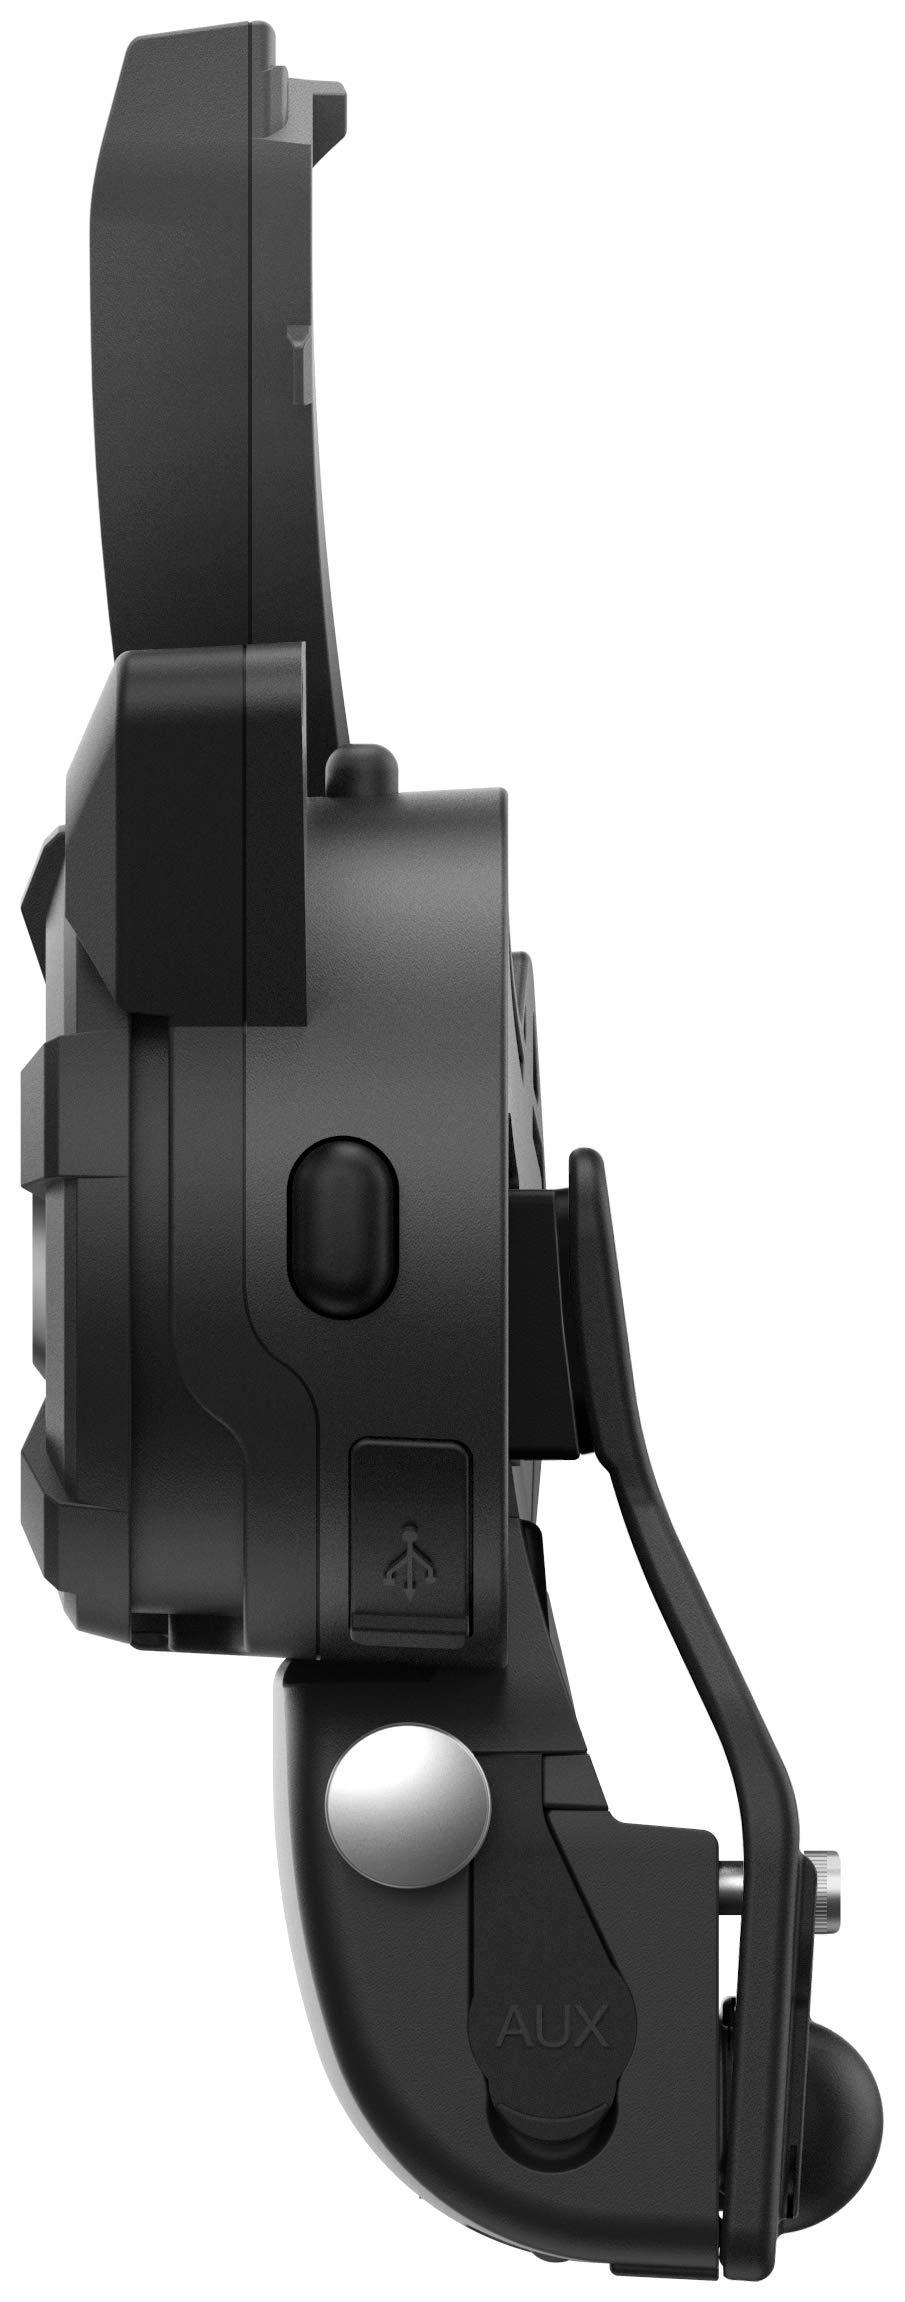 Sena-30K-01-30K-Bluetooth-Kommunikationssystem-fr-Motorrder-mit-Mesh-Intercom